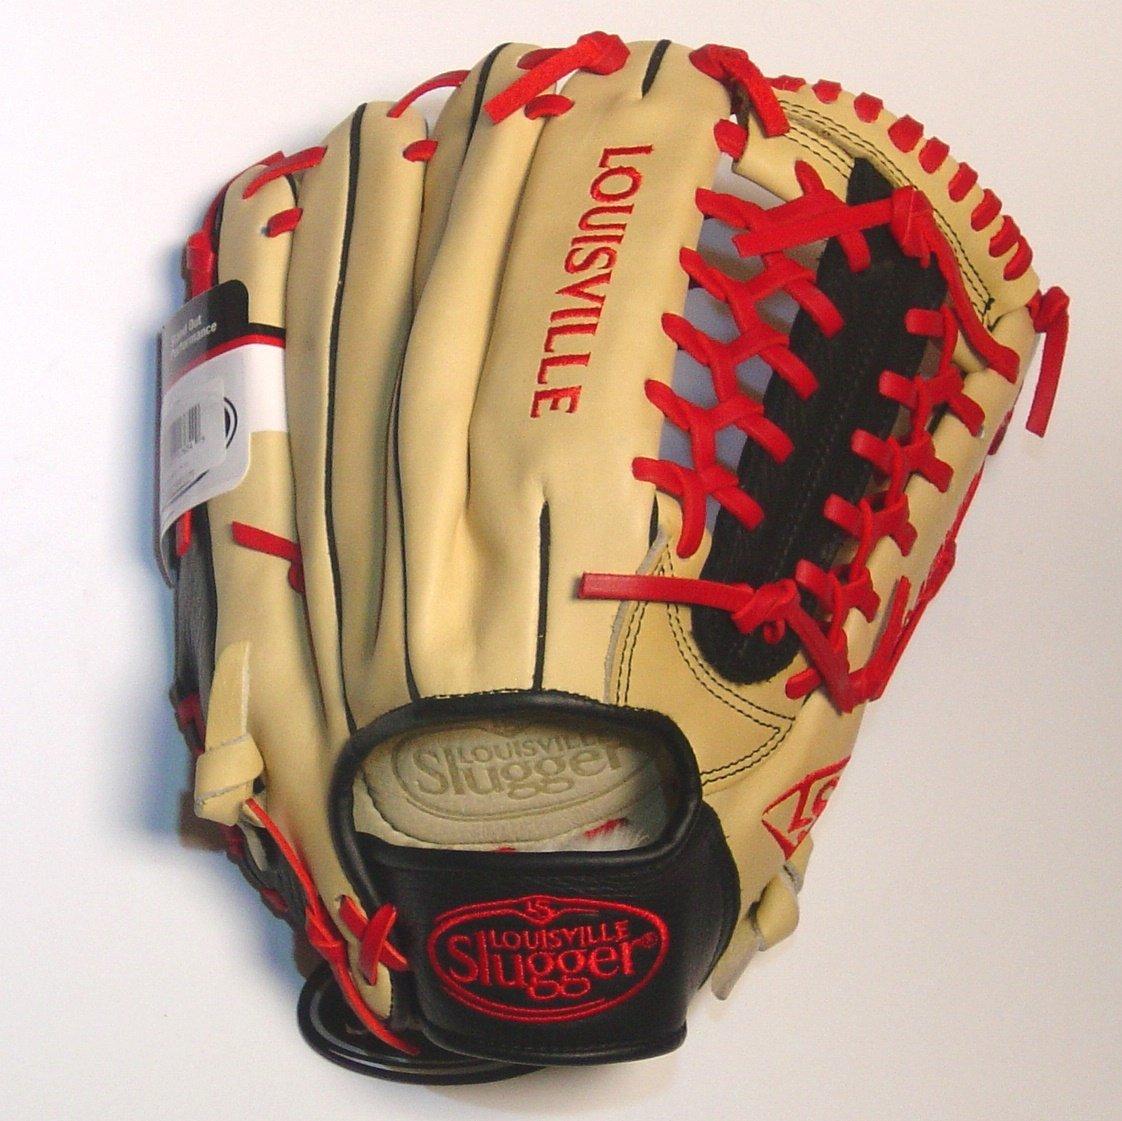 louisville-slugger-omaha-pro-11-75-baseball-glove-right-hand-throw FGOCCS6S-1175  044277176549 The Louisville Slugger Omaha Pro series brings together premium shell leather